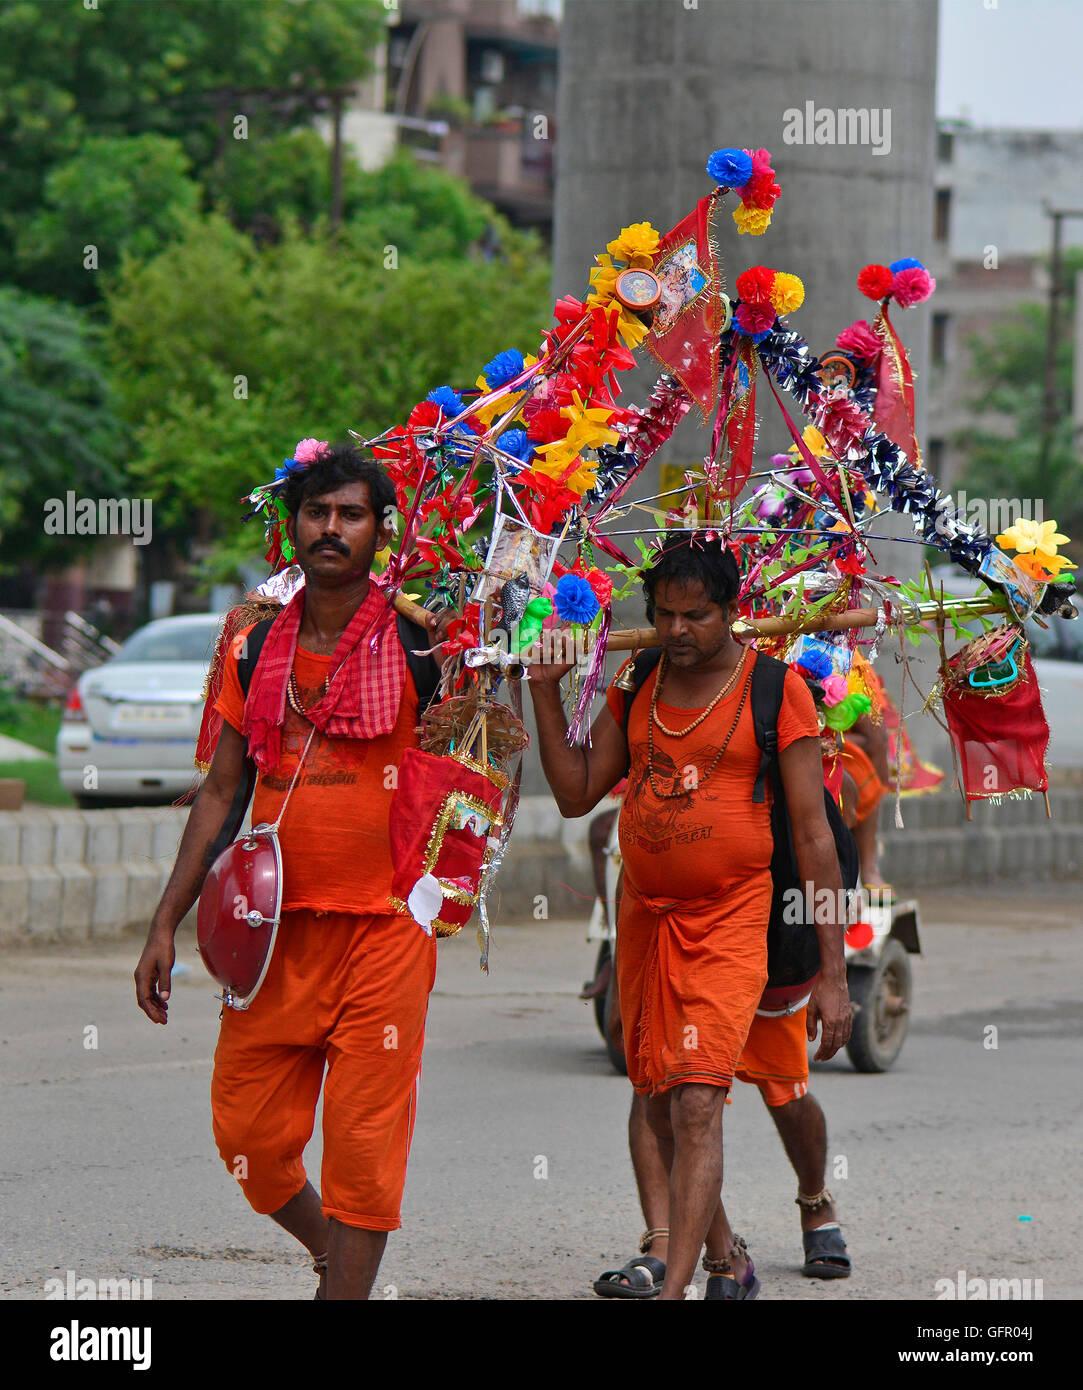 The Kānvar Yatrā or Kavad Yatra is an annual pilgrimage of devotees of Shiva, known as Kānvarias, to Hindu pilgrimage Stock Photo